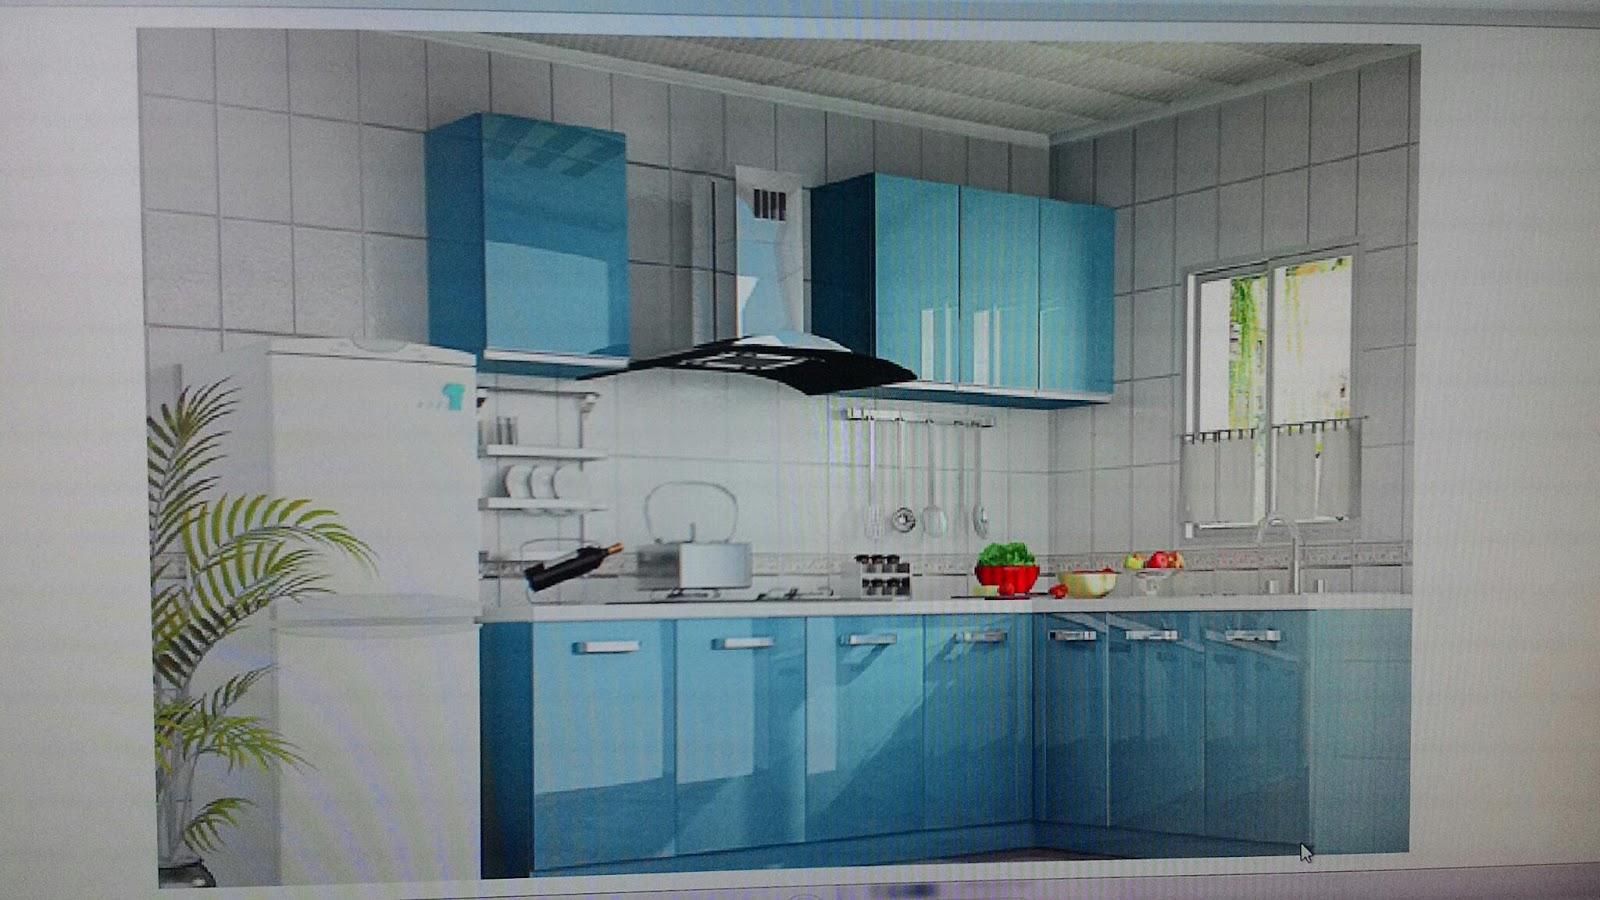 cherish every cherry: My kitchen cabinet- 3D design